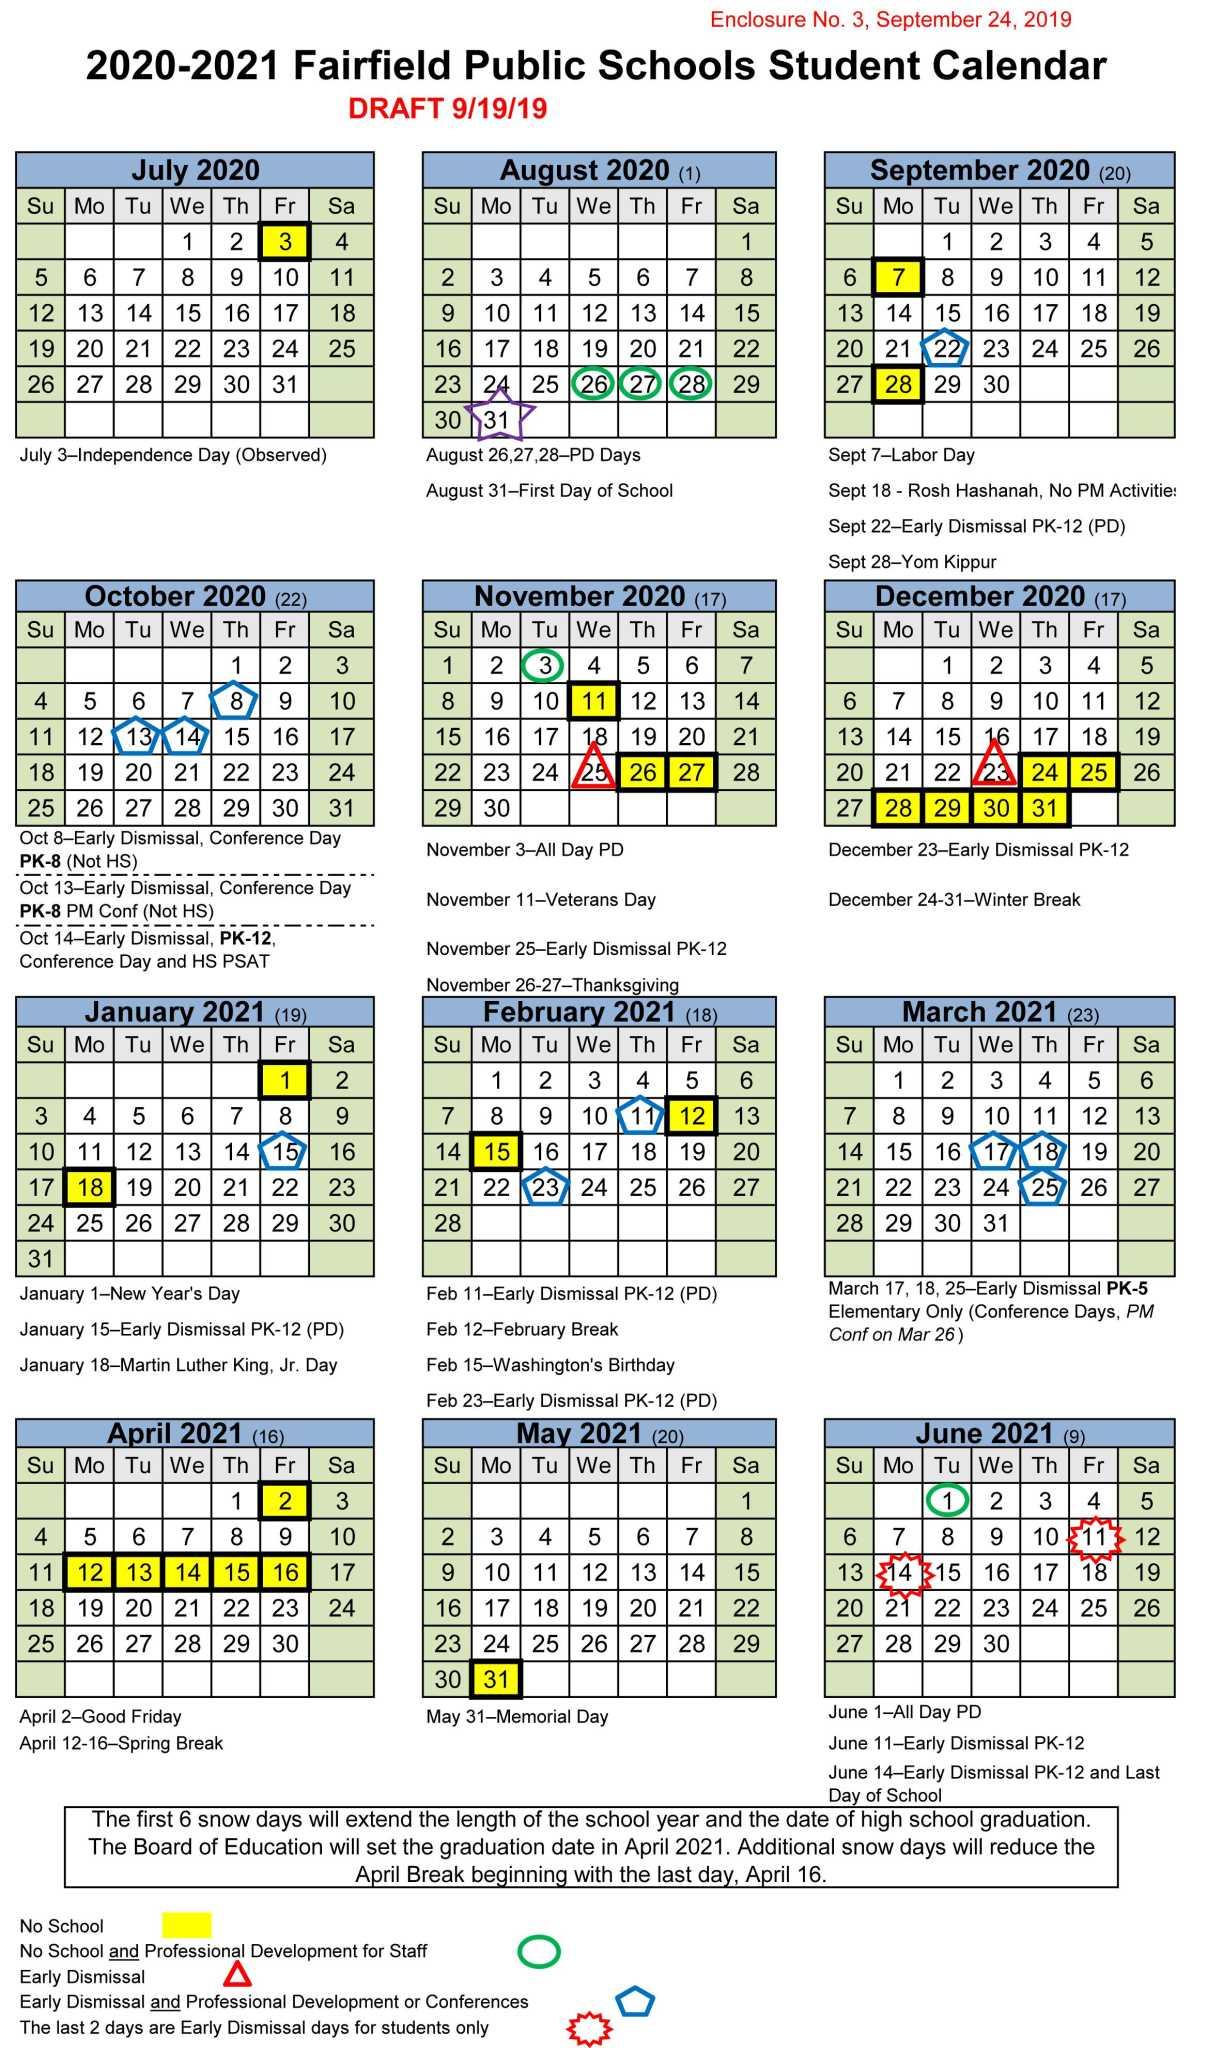 Calendar: Fairfield school board mulls development days, February